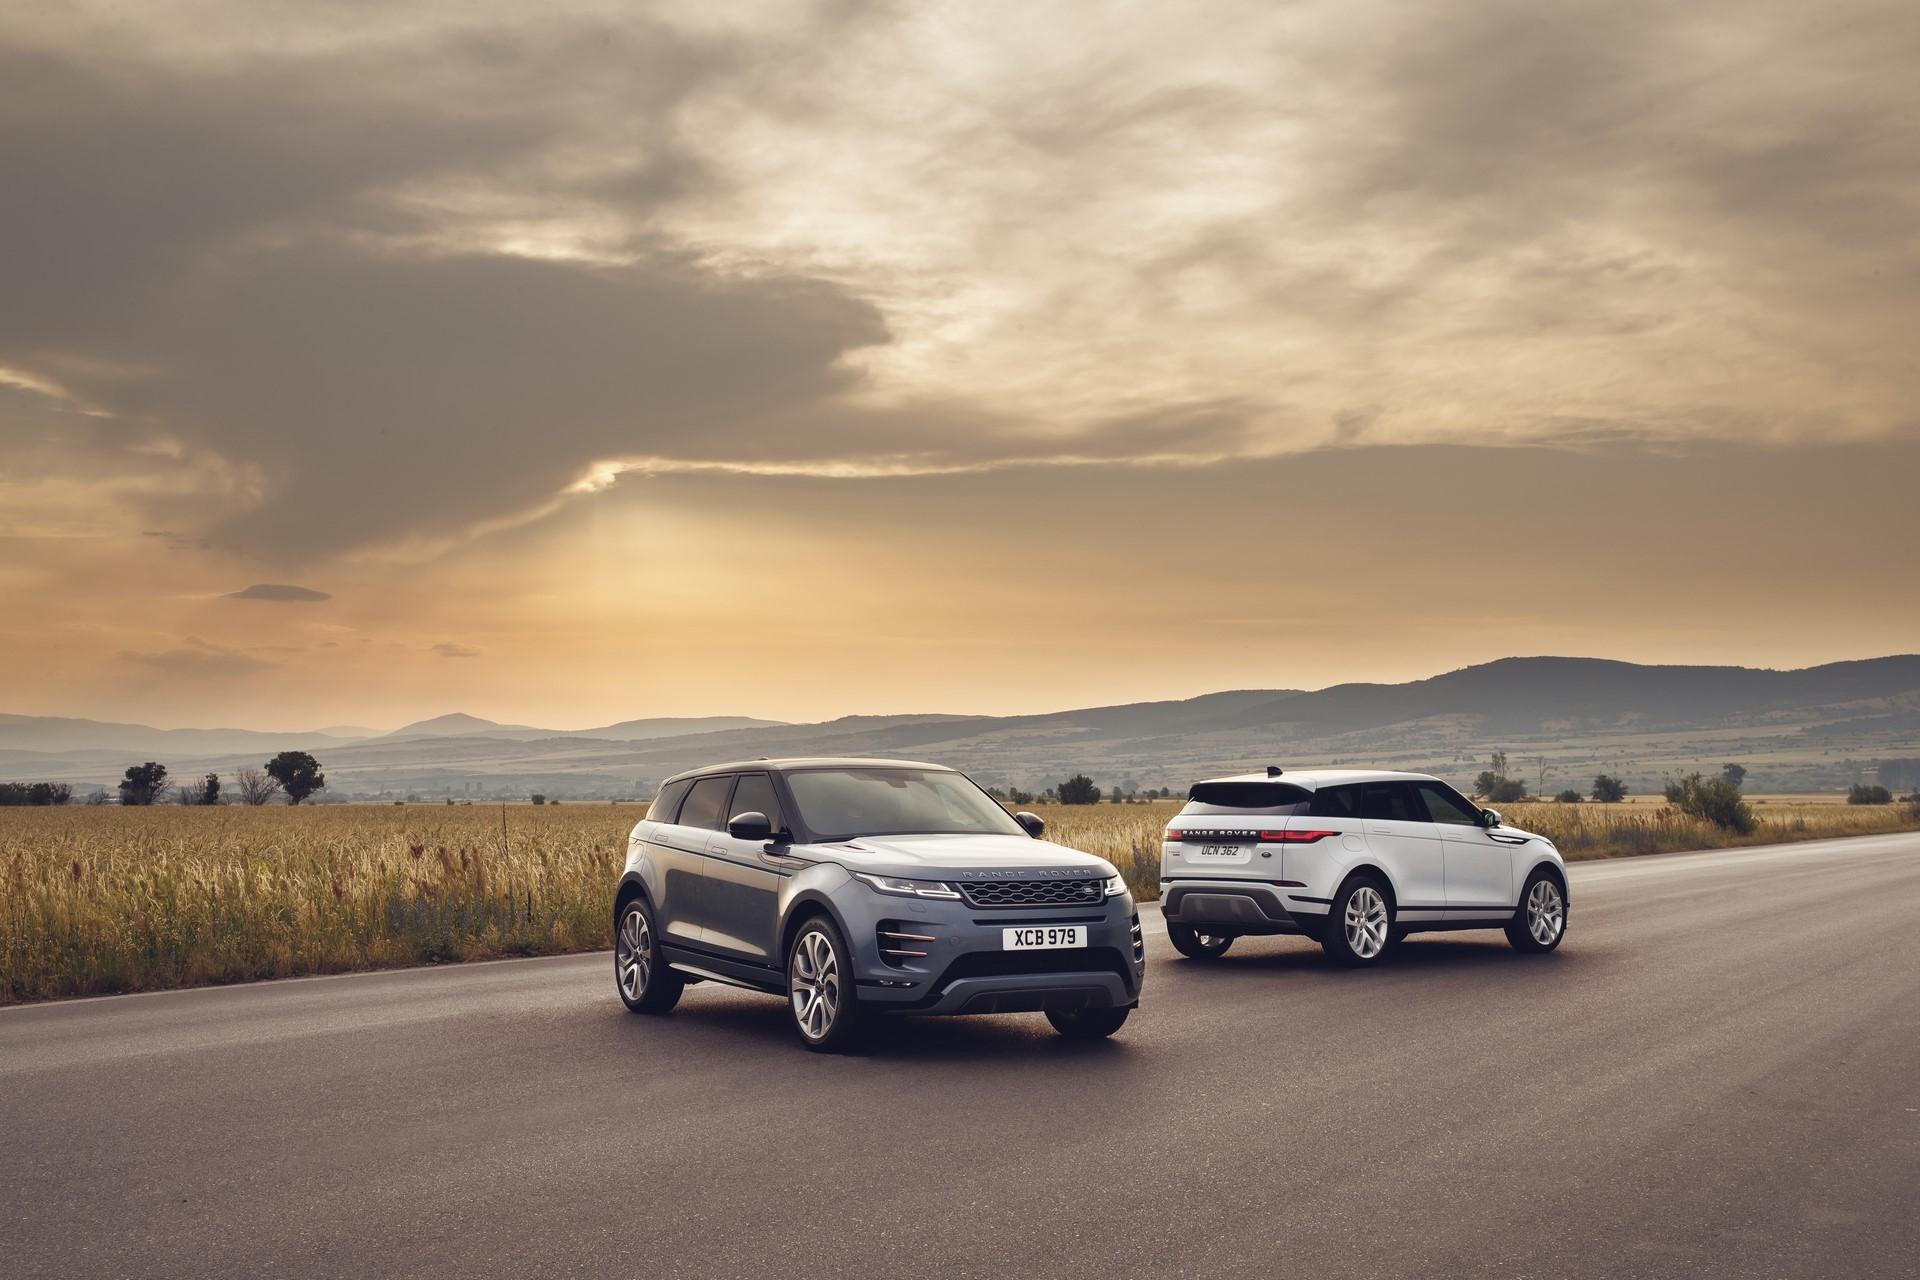 Range Rover Evoque 2019 (139)